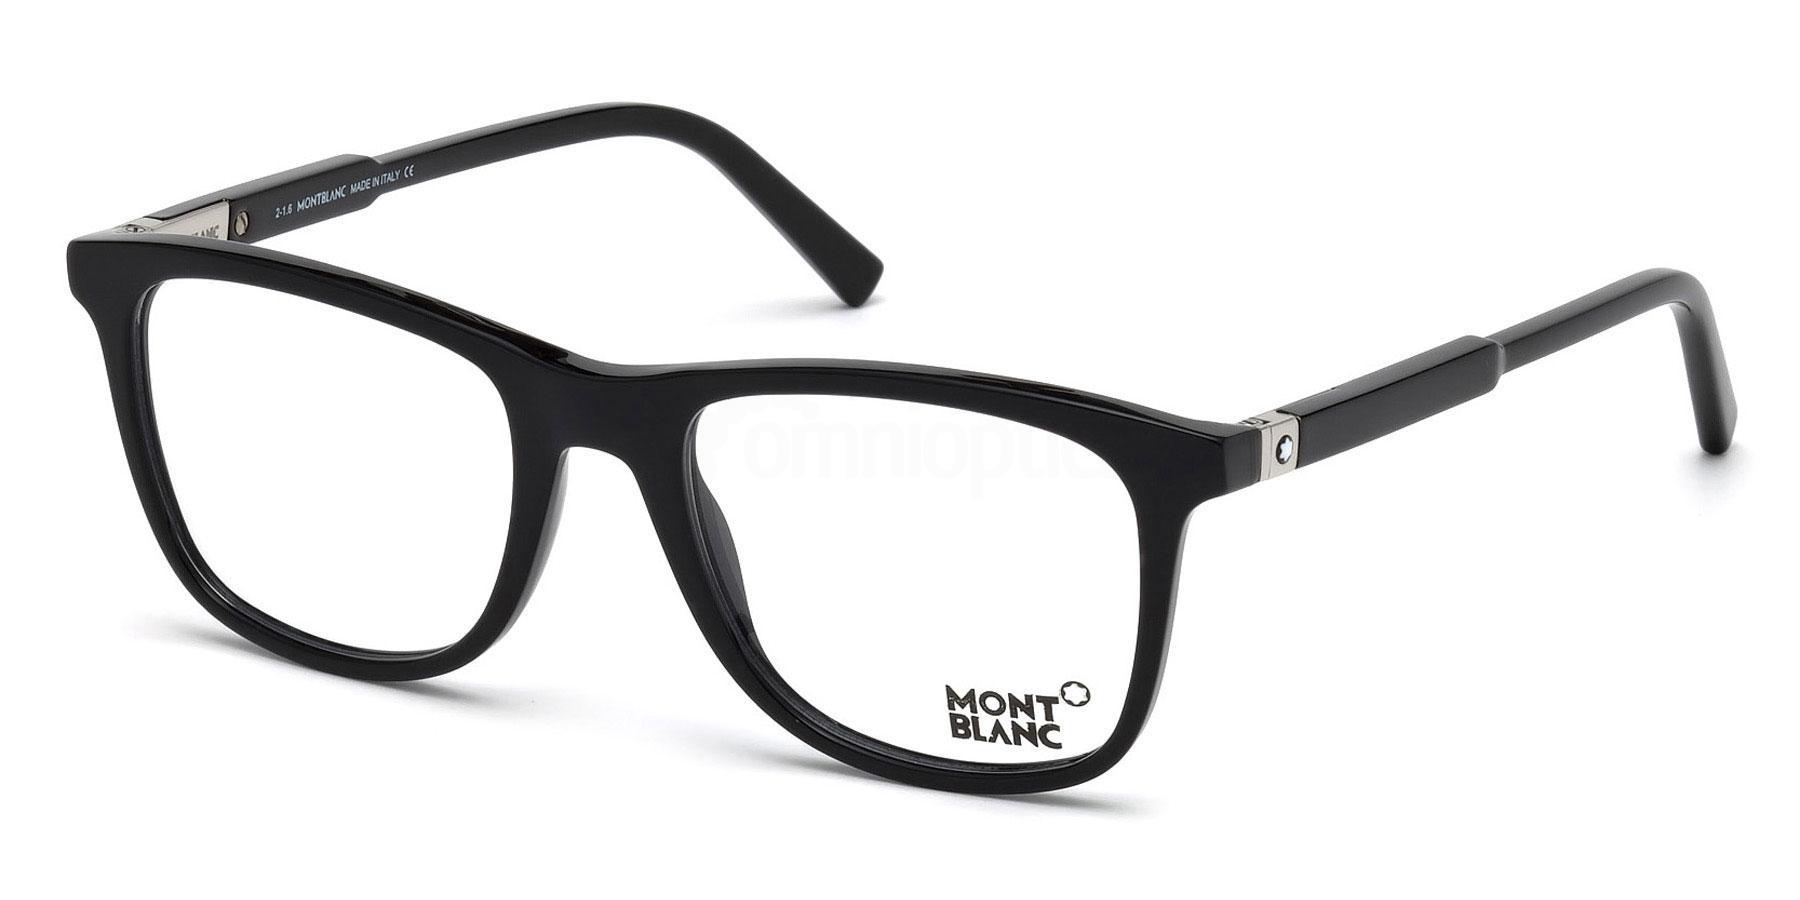 001 MB0637 Glasses, Mont Blanc